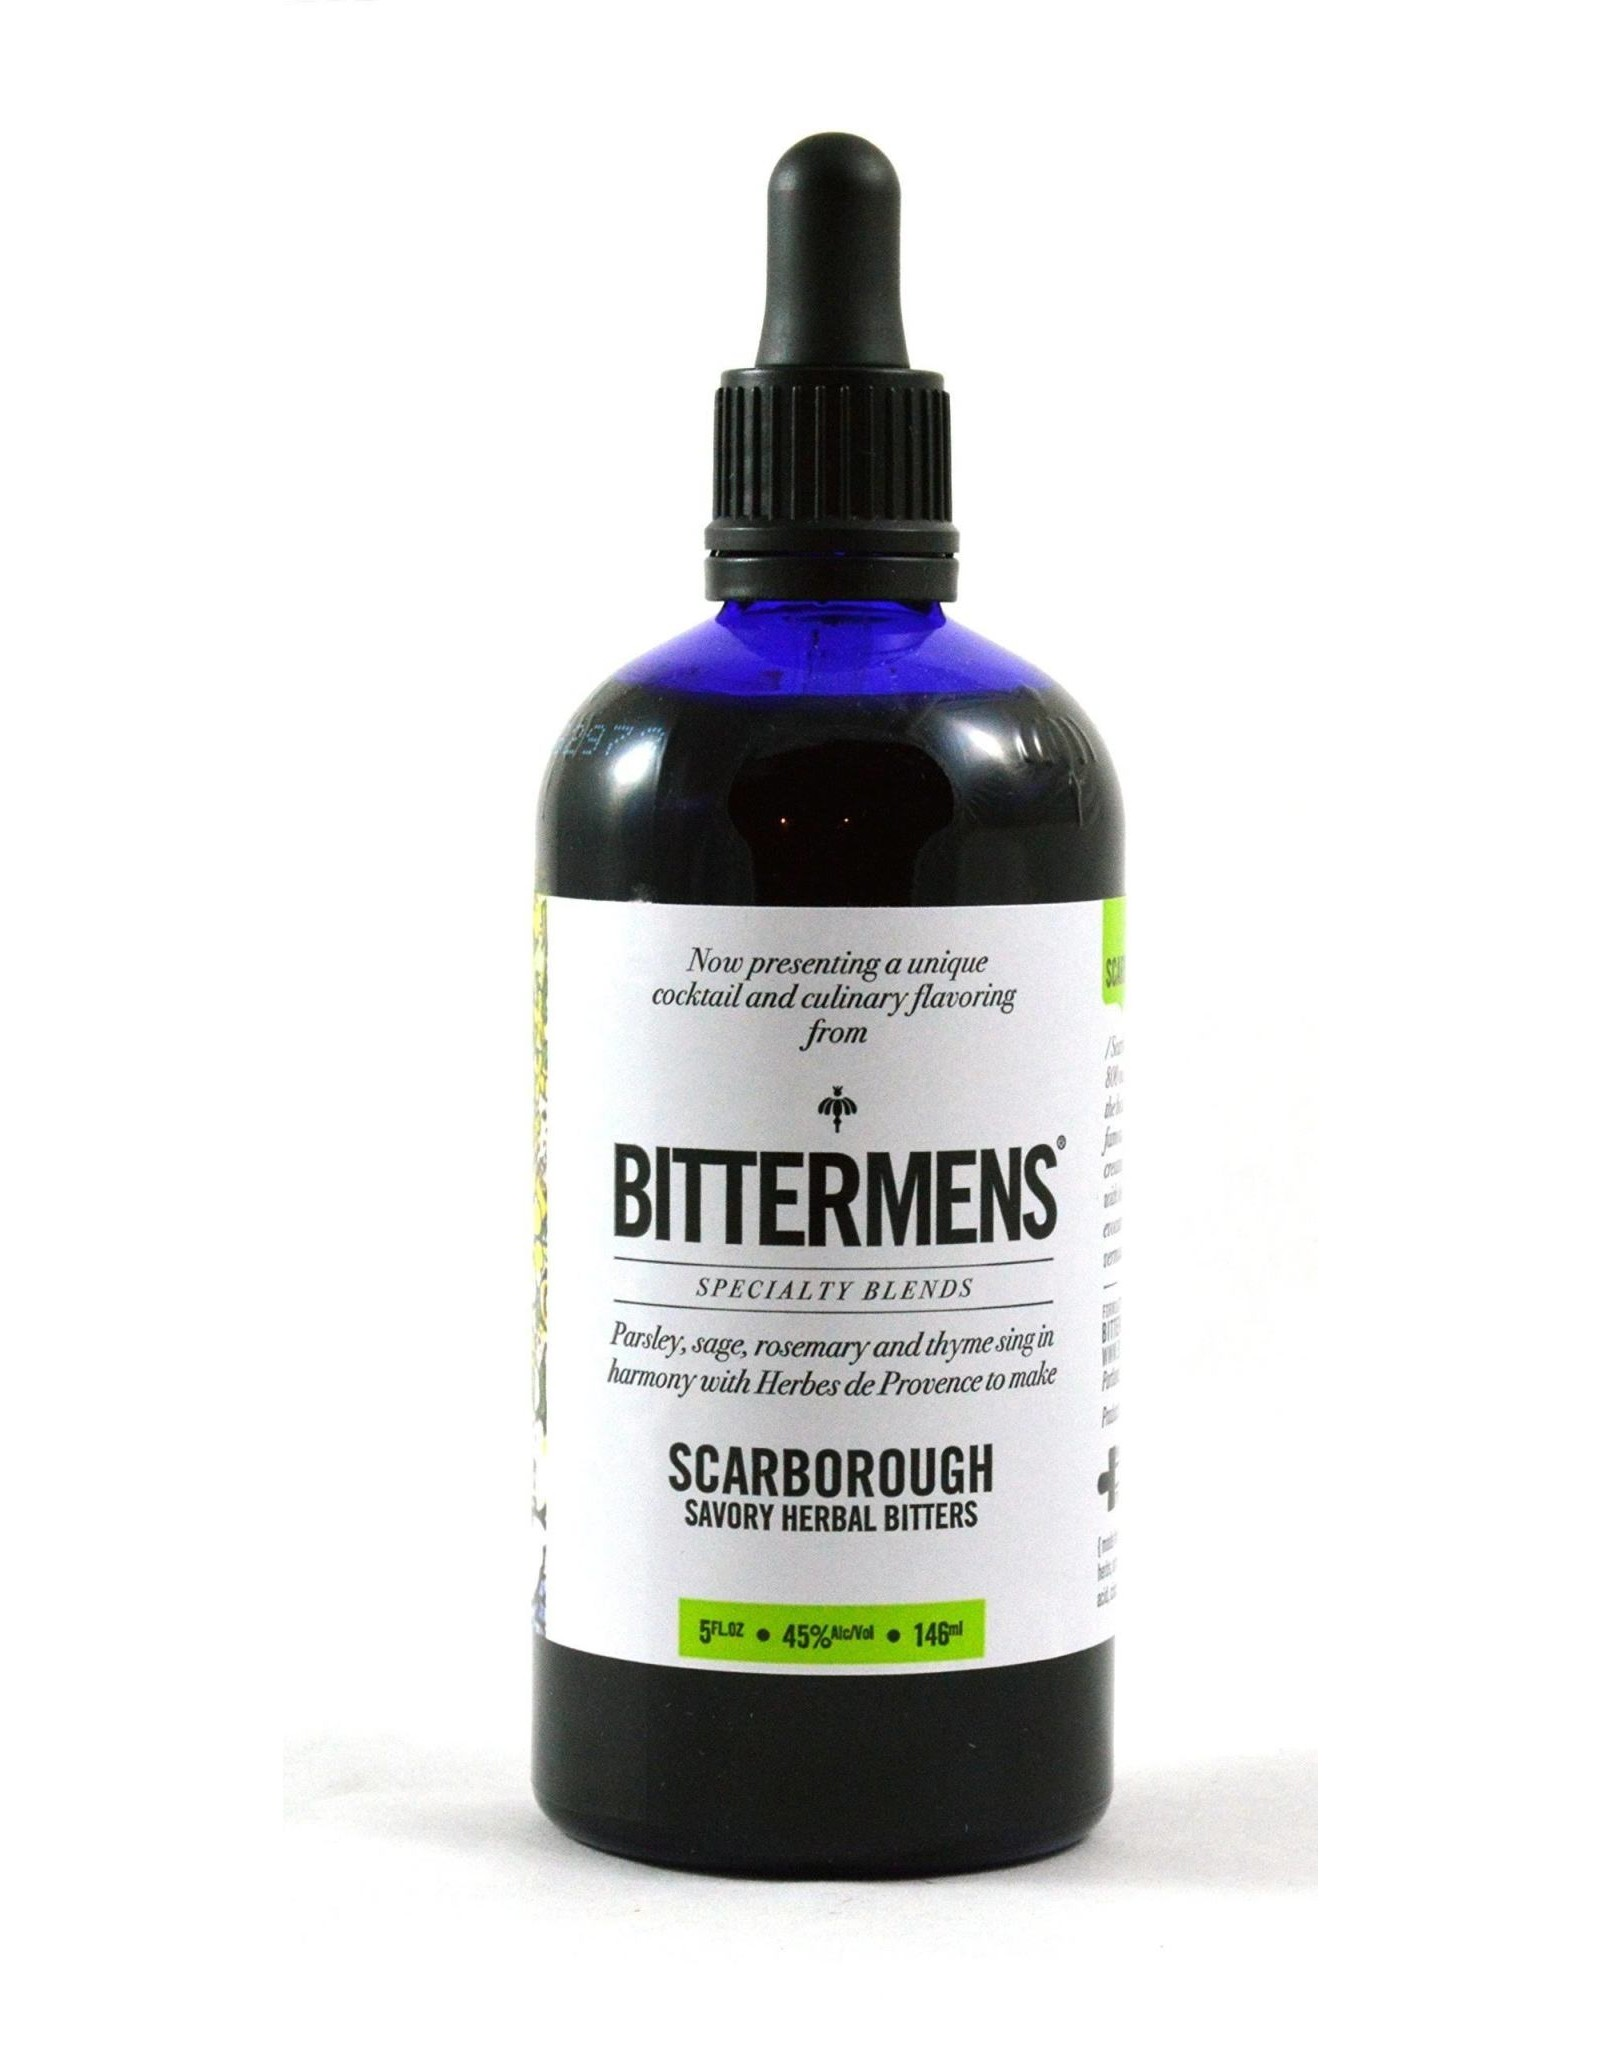 Bittermens Bittermens Scarborough Savory Herbal Bitters